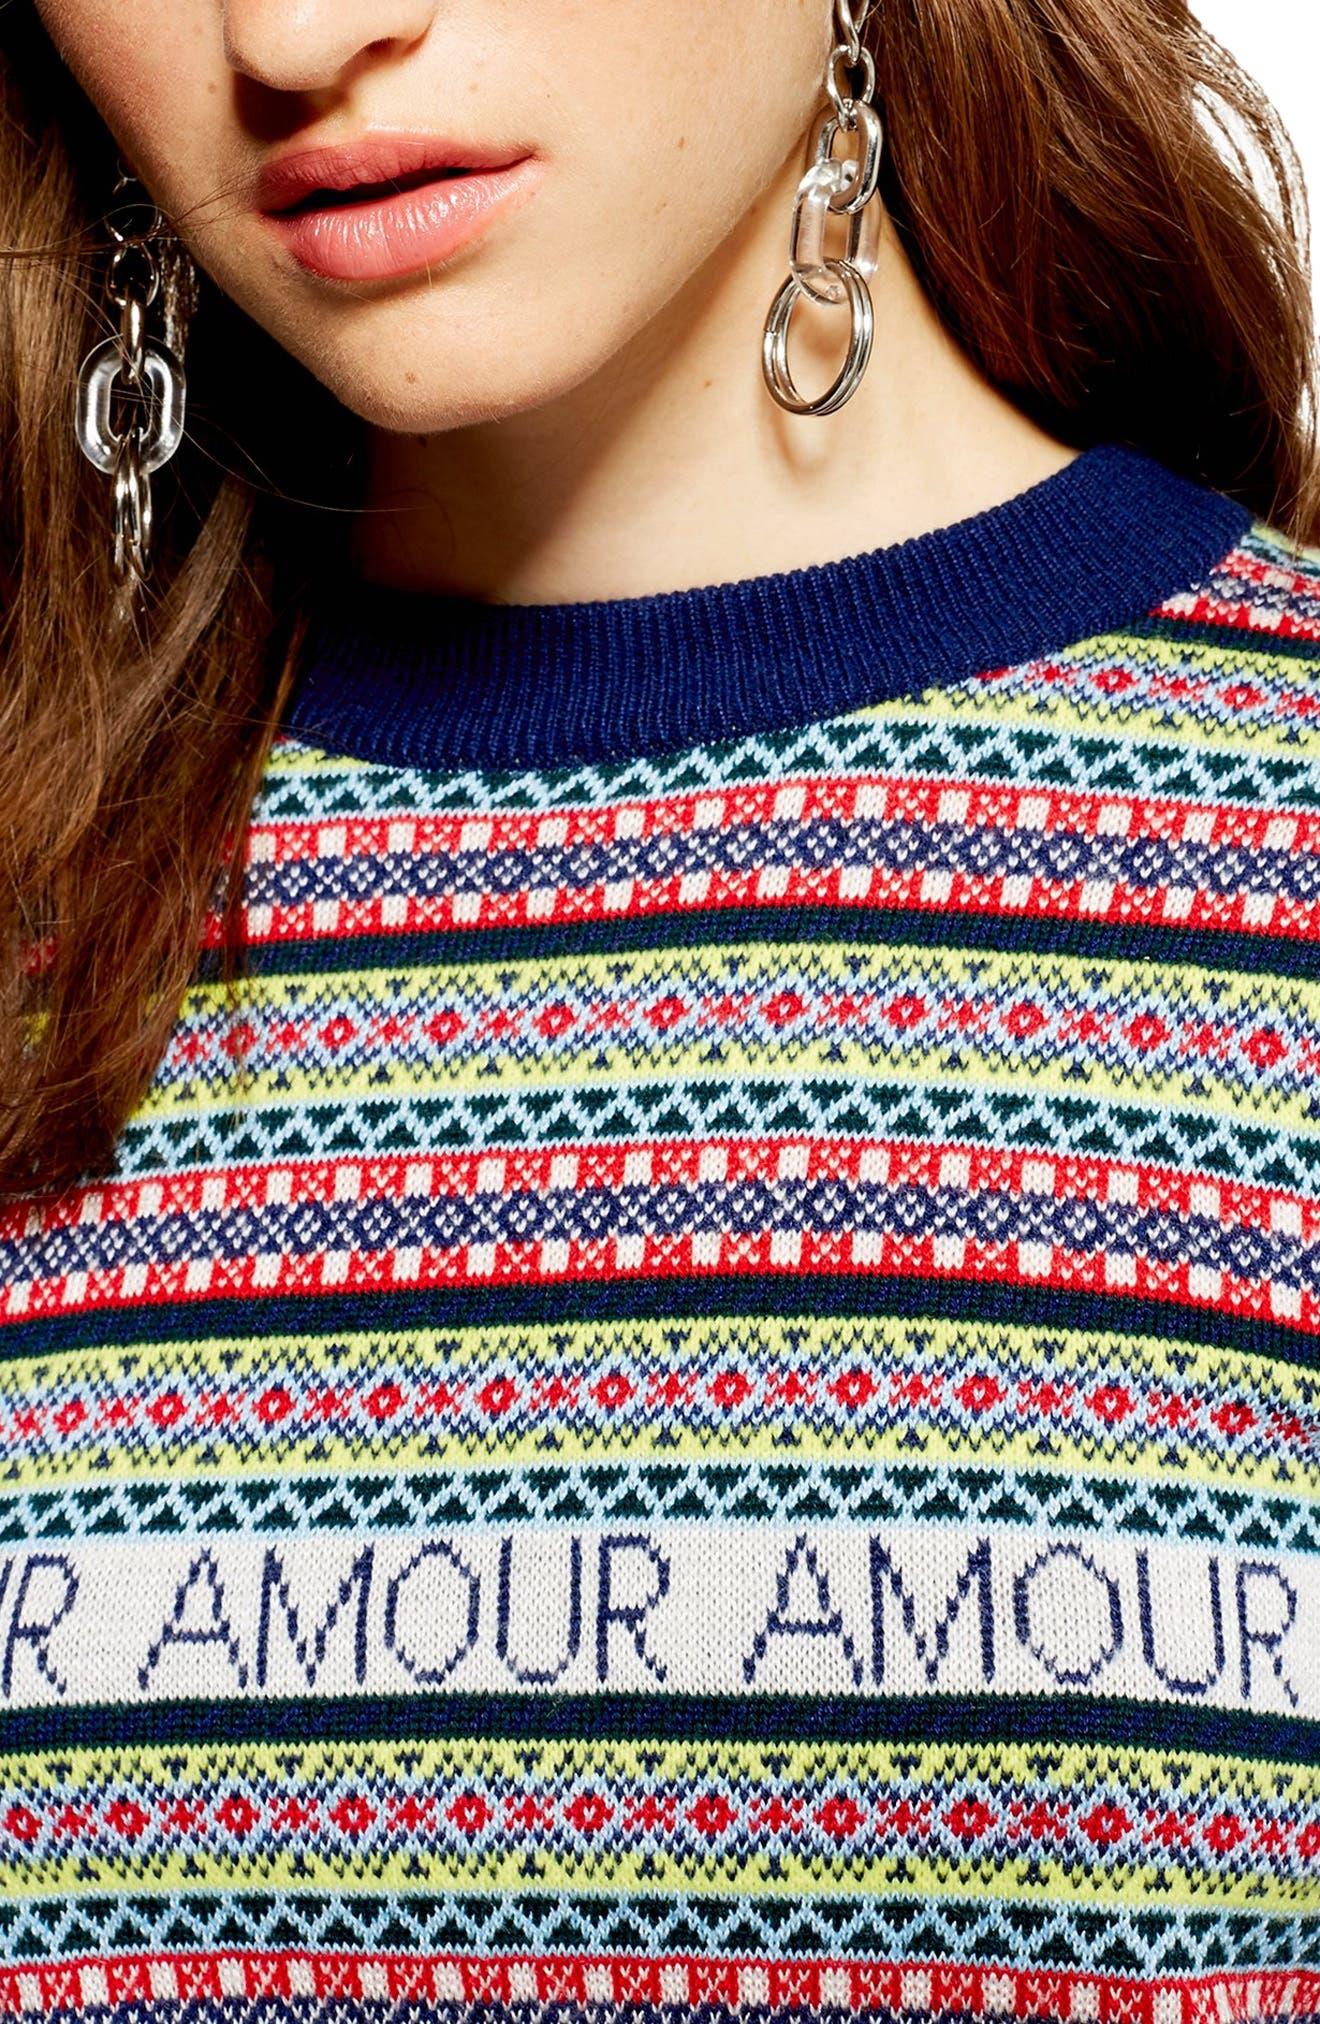 Amour Fair Isle Sweater,                             Alternate thumbnail 3, color,                             NAVY BLUE MULTI